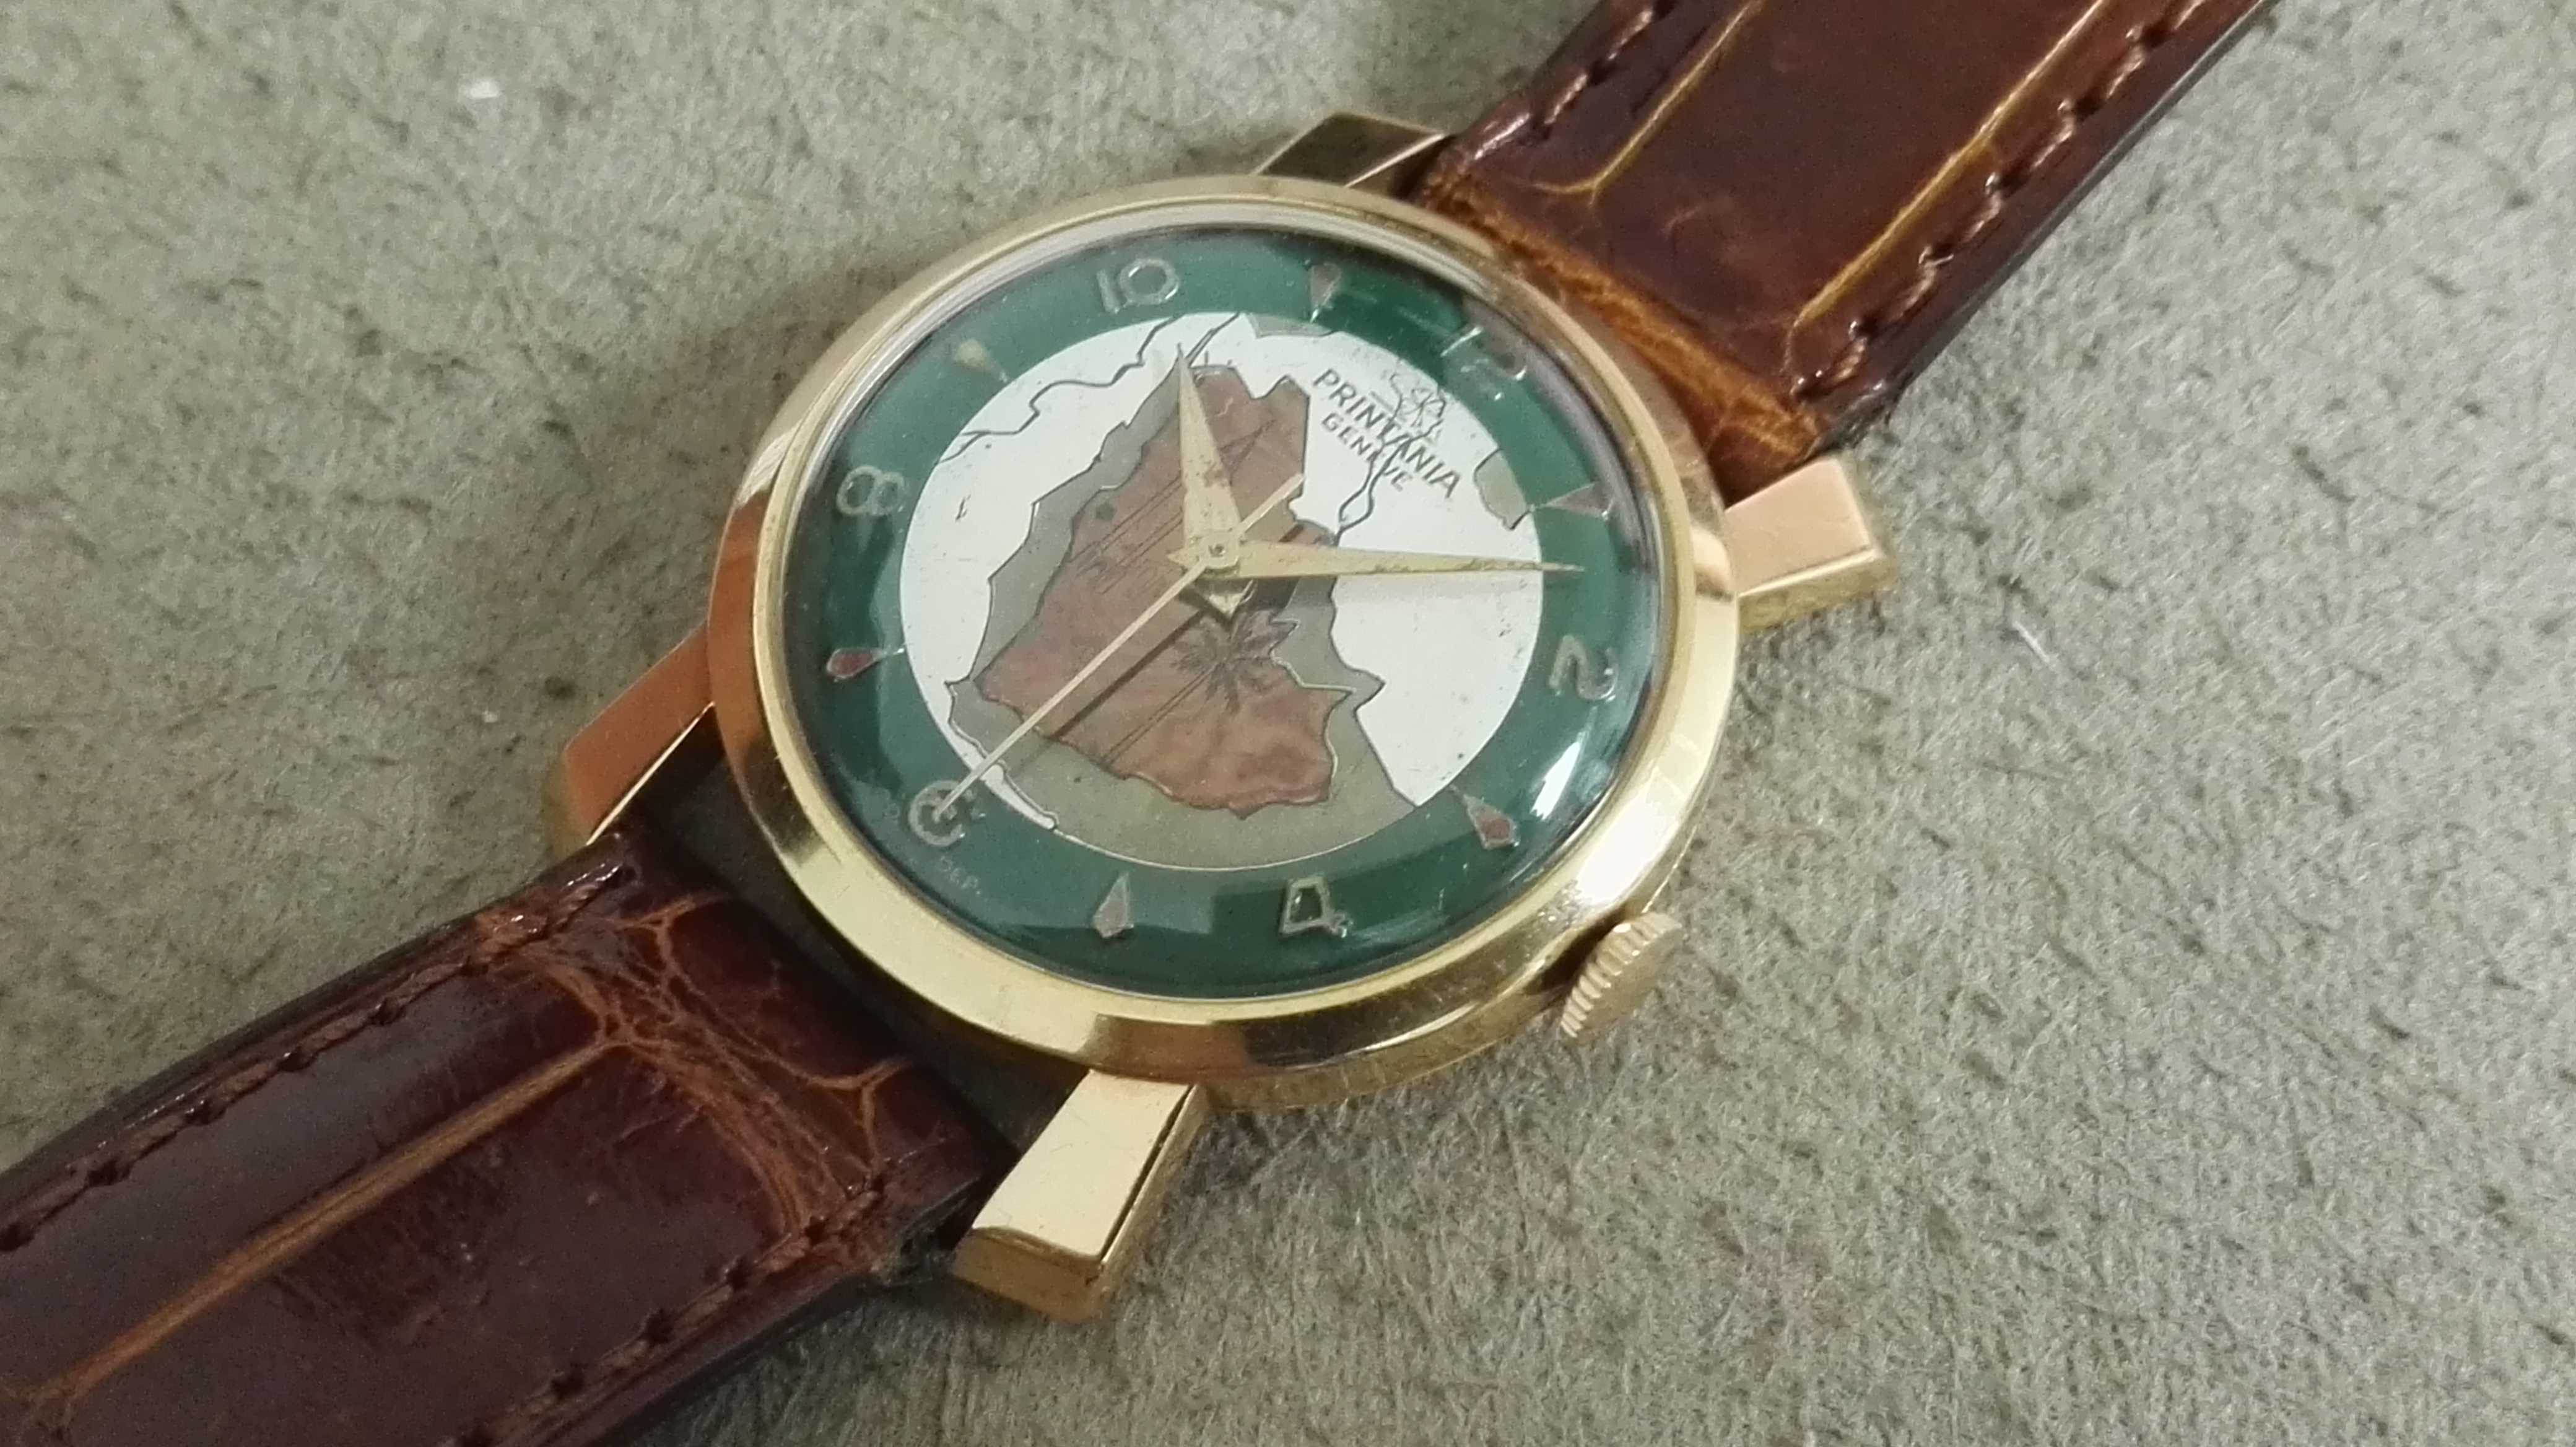 Anonimo Printania Rare Swiss wrist watch enamel dial 18 kt rose gold mm 30 | San Giorgio a Cremano